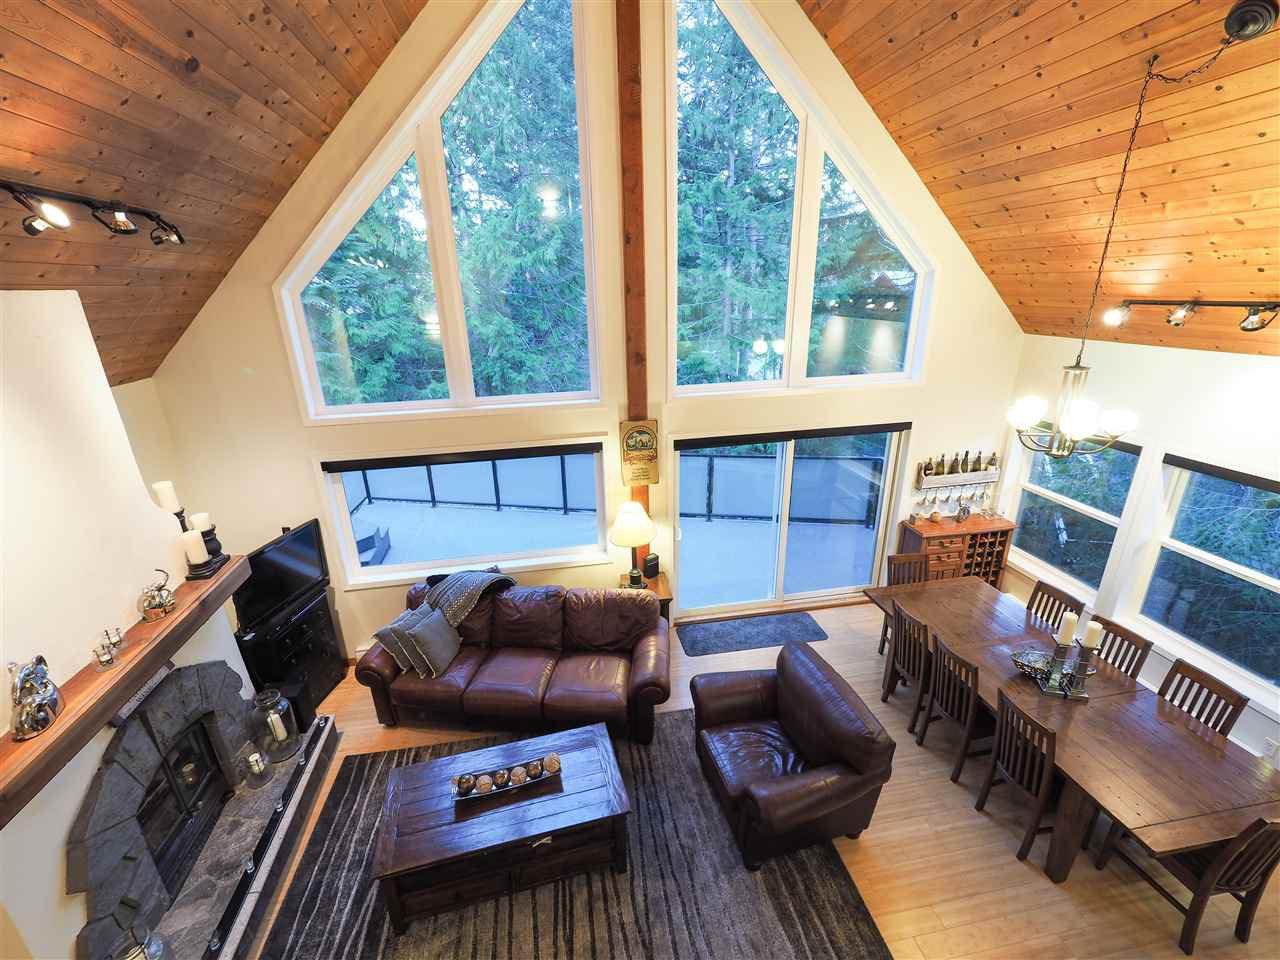 Main Photo: 8124 ALDER LANE in Whistler: Alpine Meadows House for sale : MLS®# R2461935